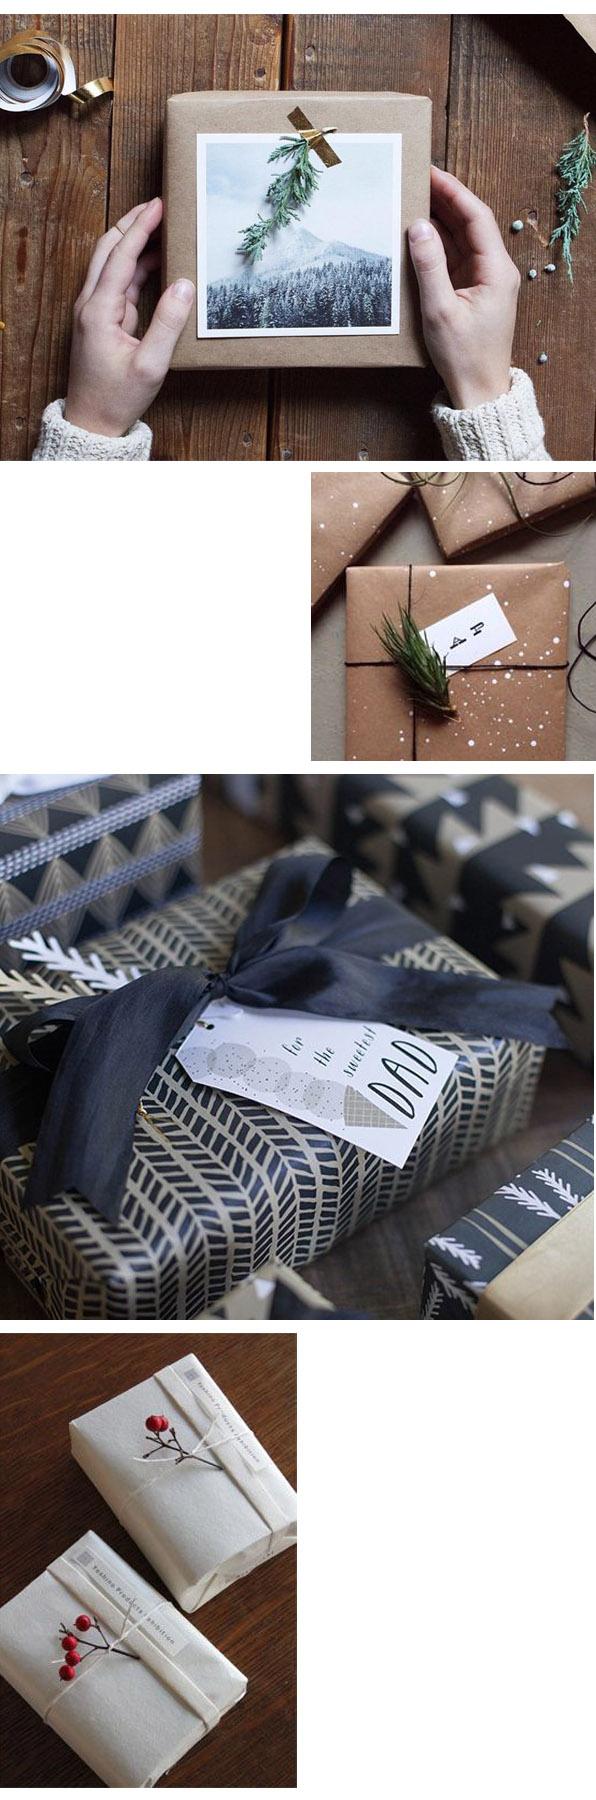 regalos paquetes navidad modus vivendi adornos navideños christmas gift diy handmade caseros